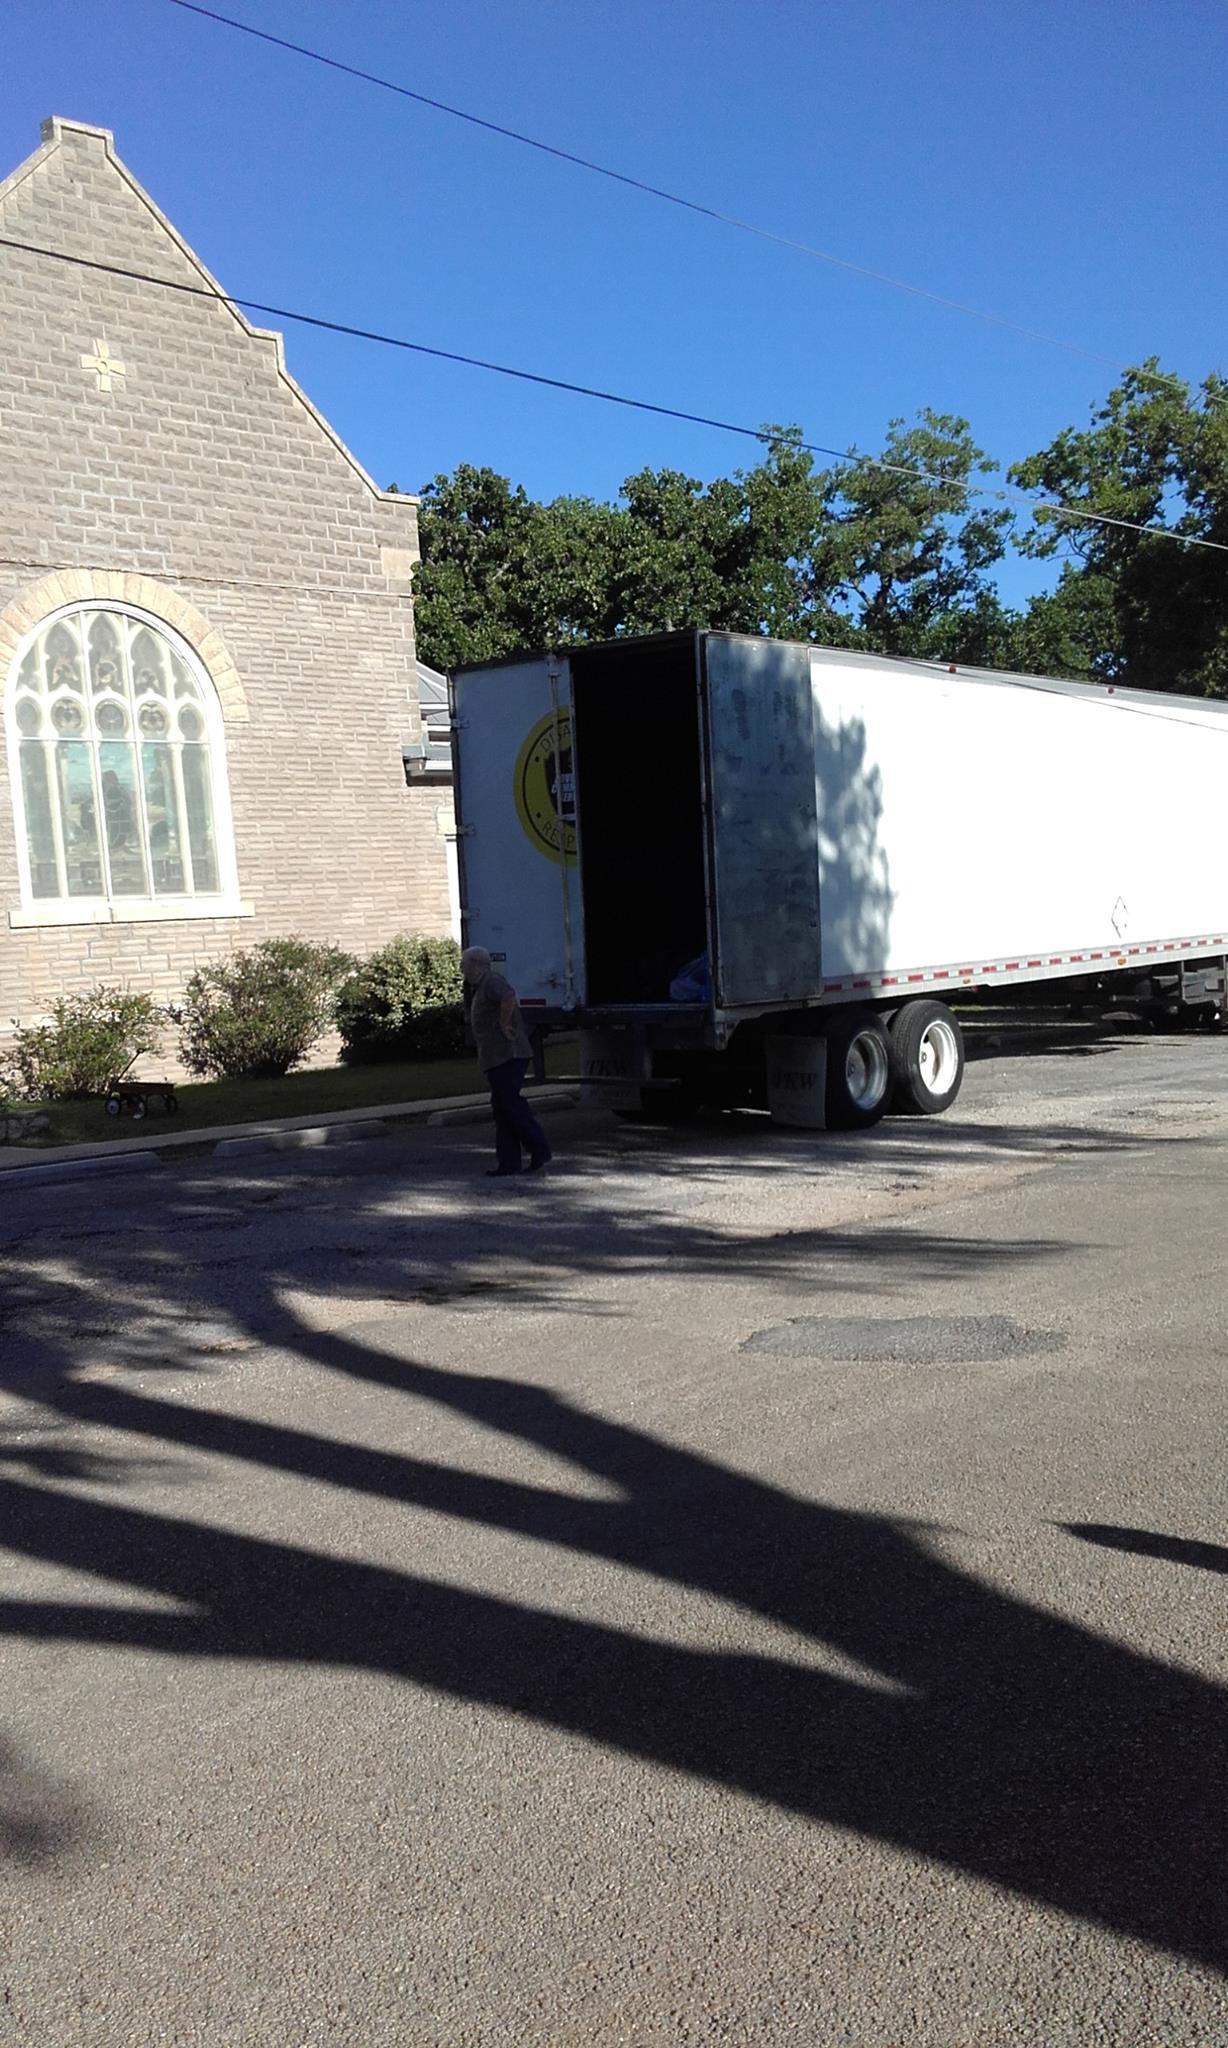 centerpint_umc_adventist_disaster_clothing_drive_pickup6.jpg